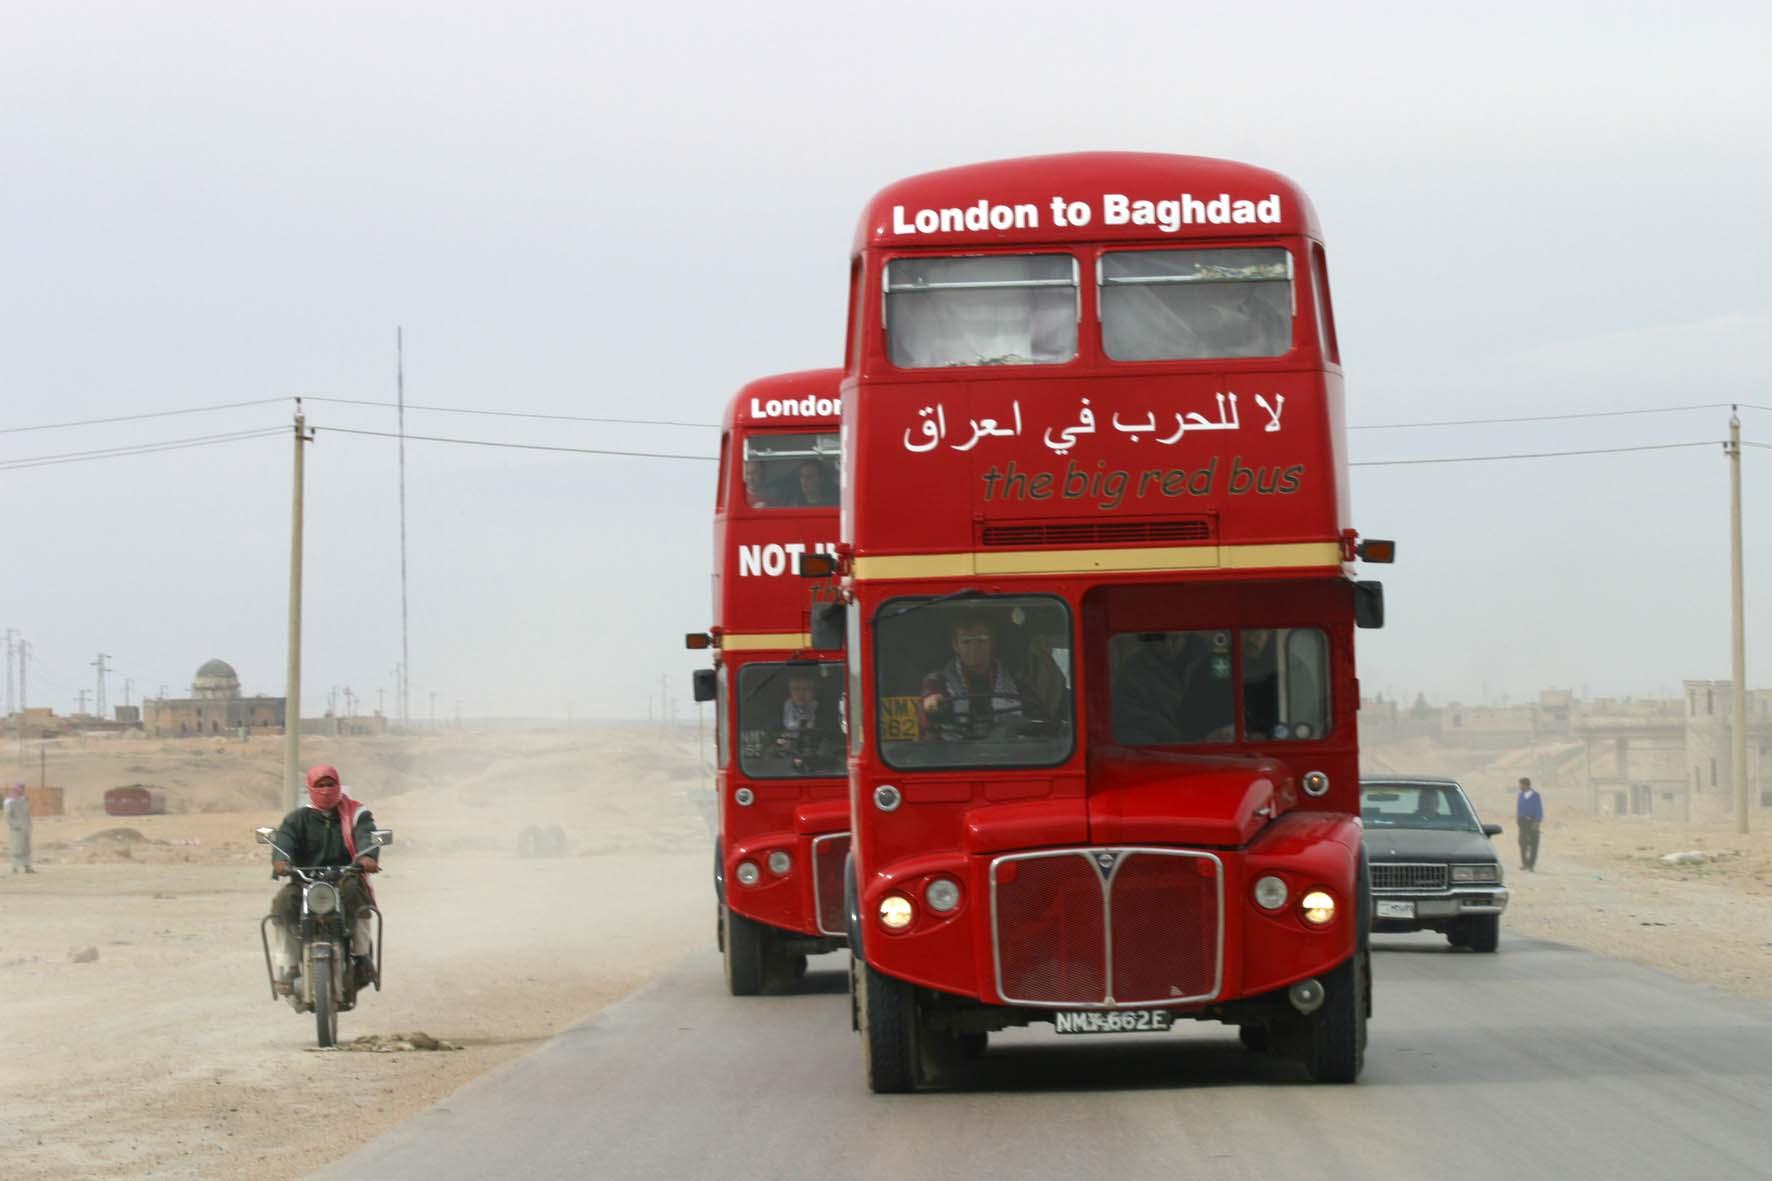 London to Baghdad Bus